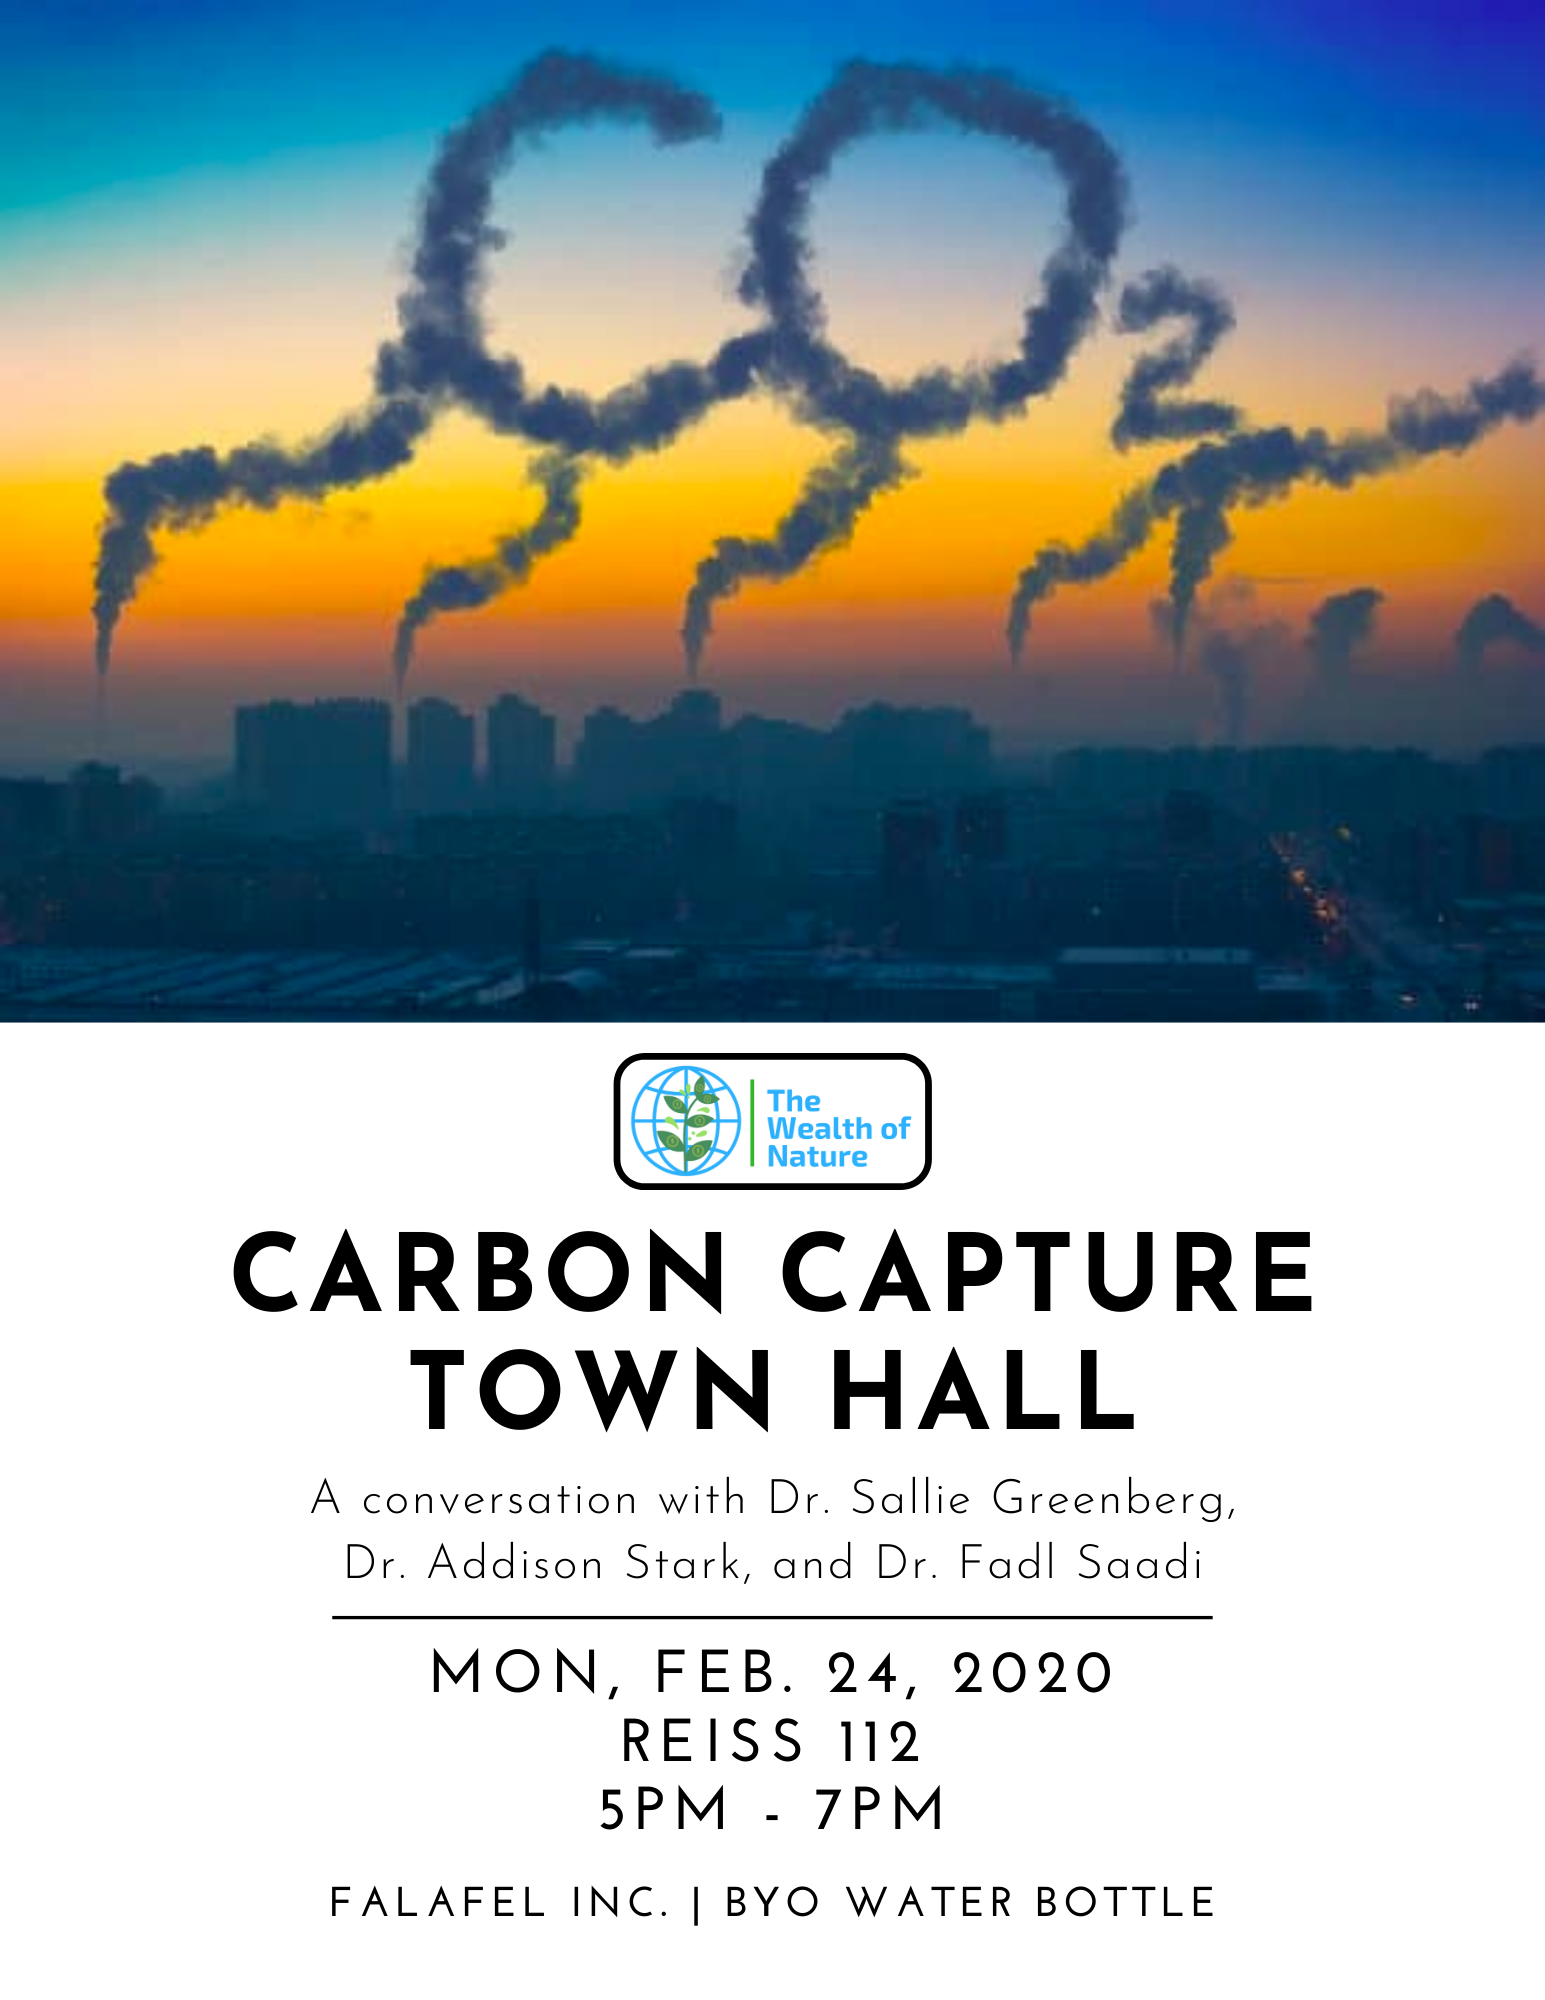 Carbon Capture Town Hall